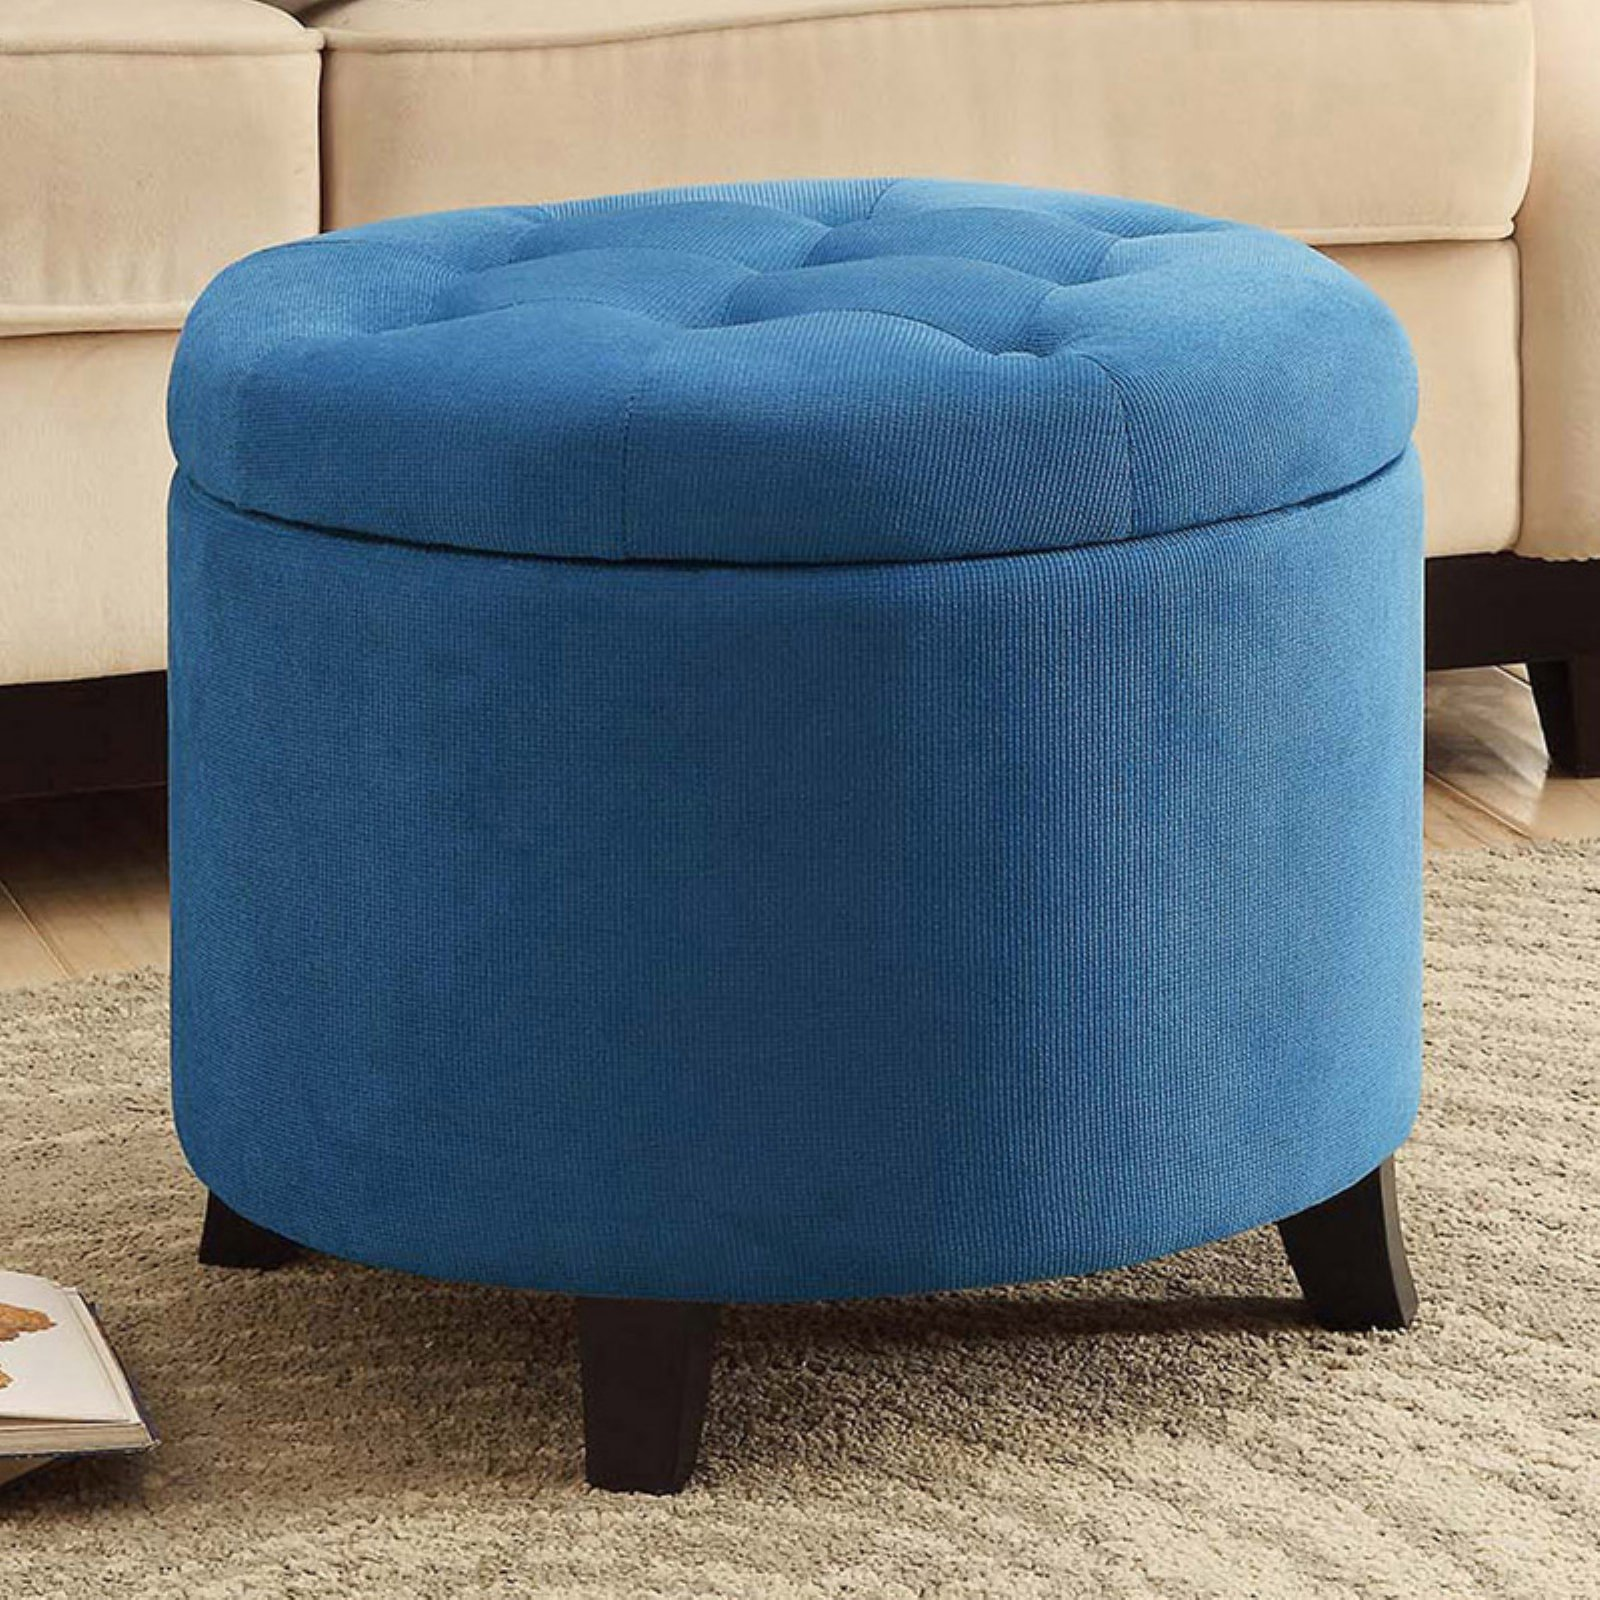 Convenience Concepts Designs4Comfort Round Ottoman, Multiple Colors by Convenience Concepts